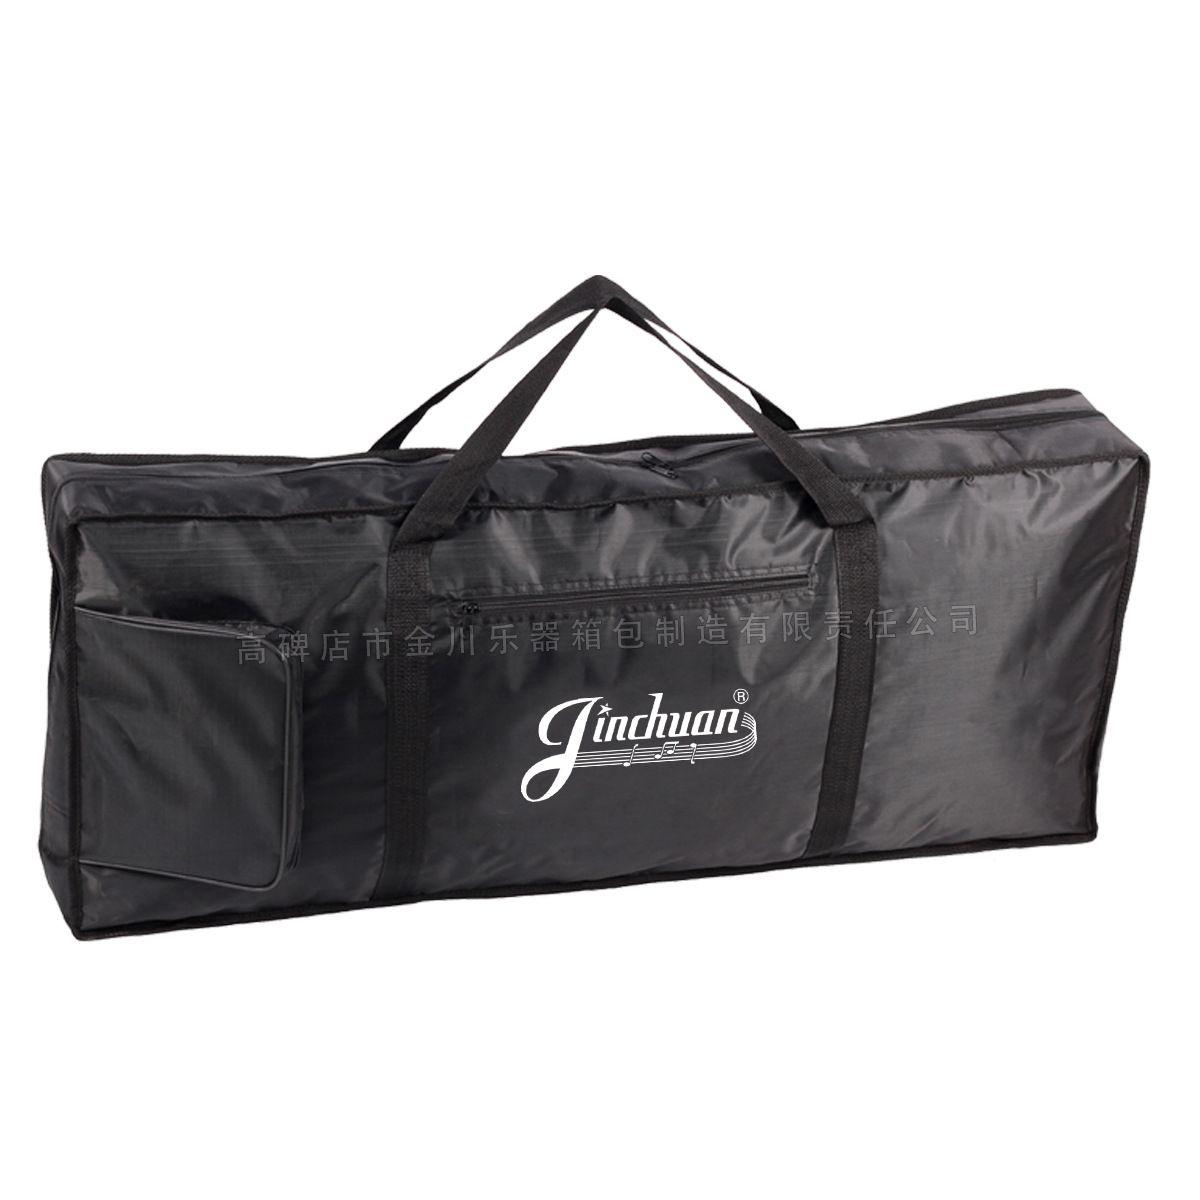 61 key general universal keyboard bag package electronic piano bag waterproof electronic organ bag Instrument Bags free shipping